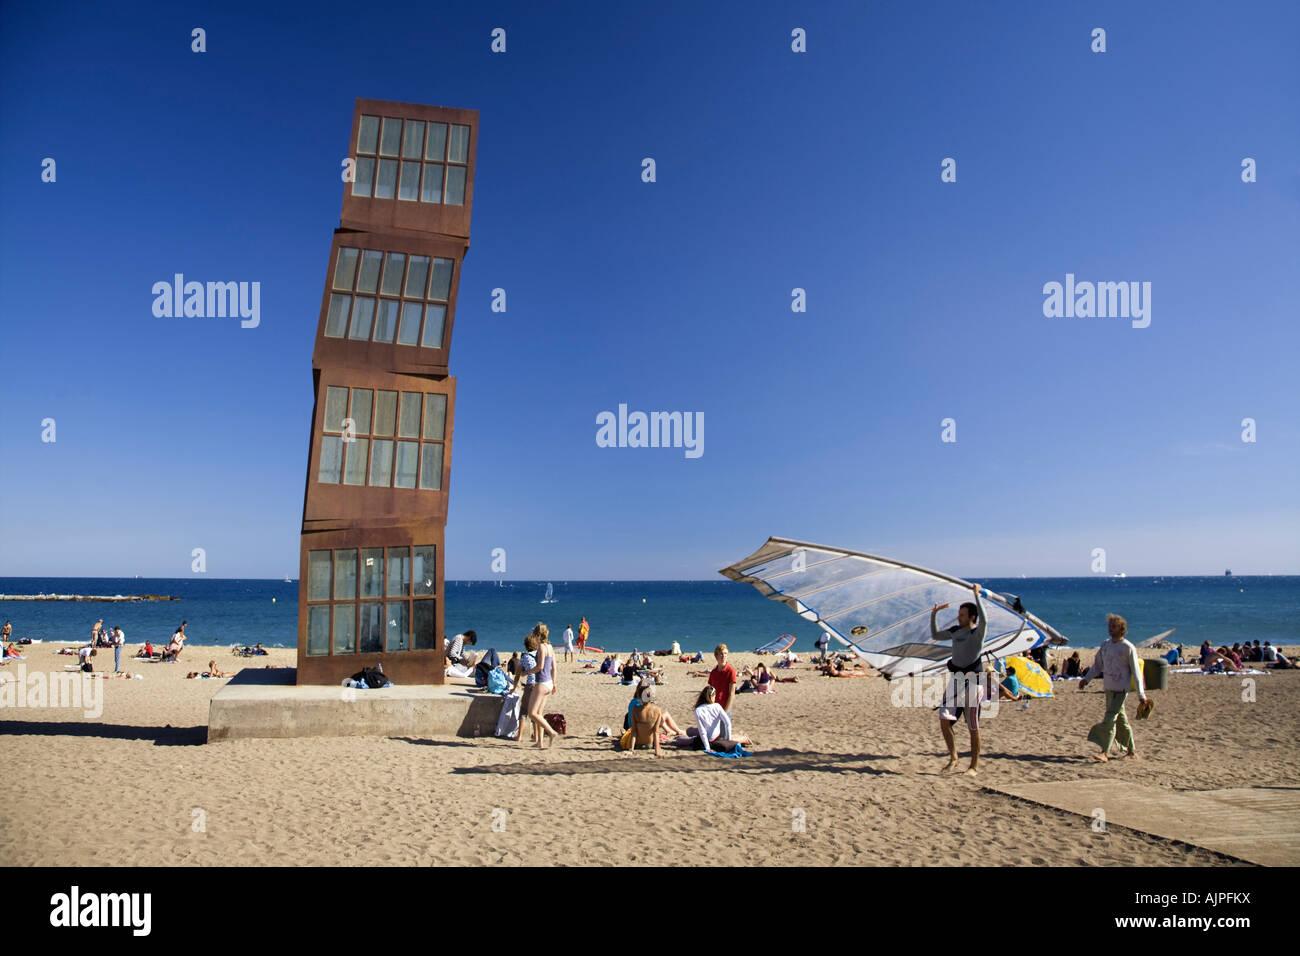 Spain Barcelona Sculpture by Rebecca Horn at Barceloneta beach Surfer Stock Photo